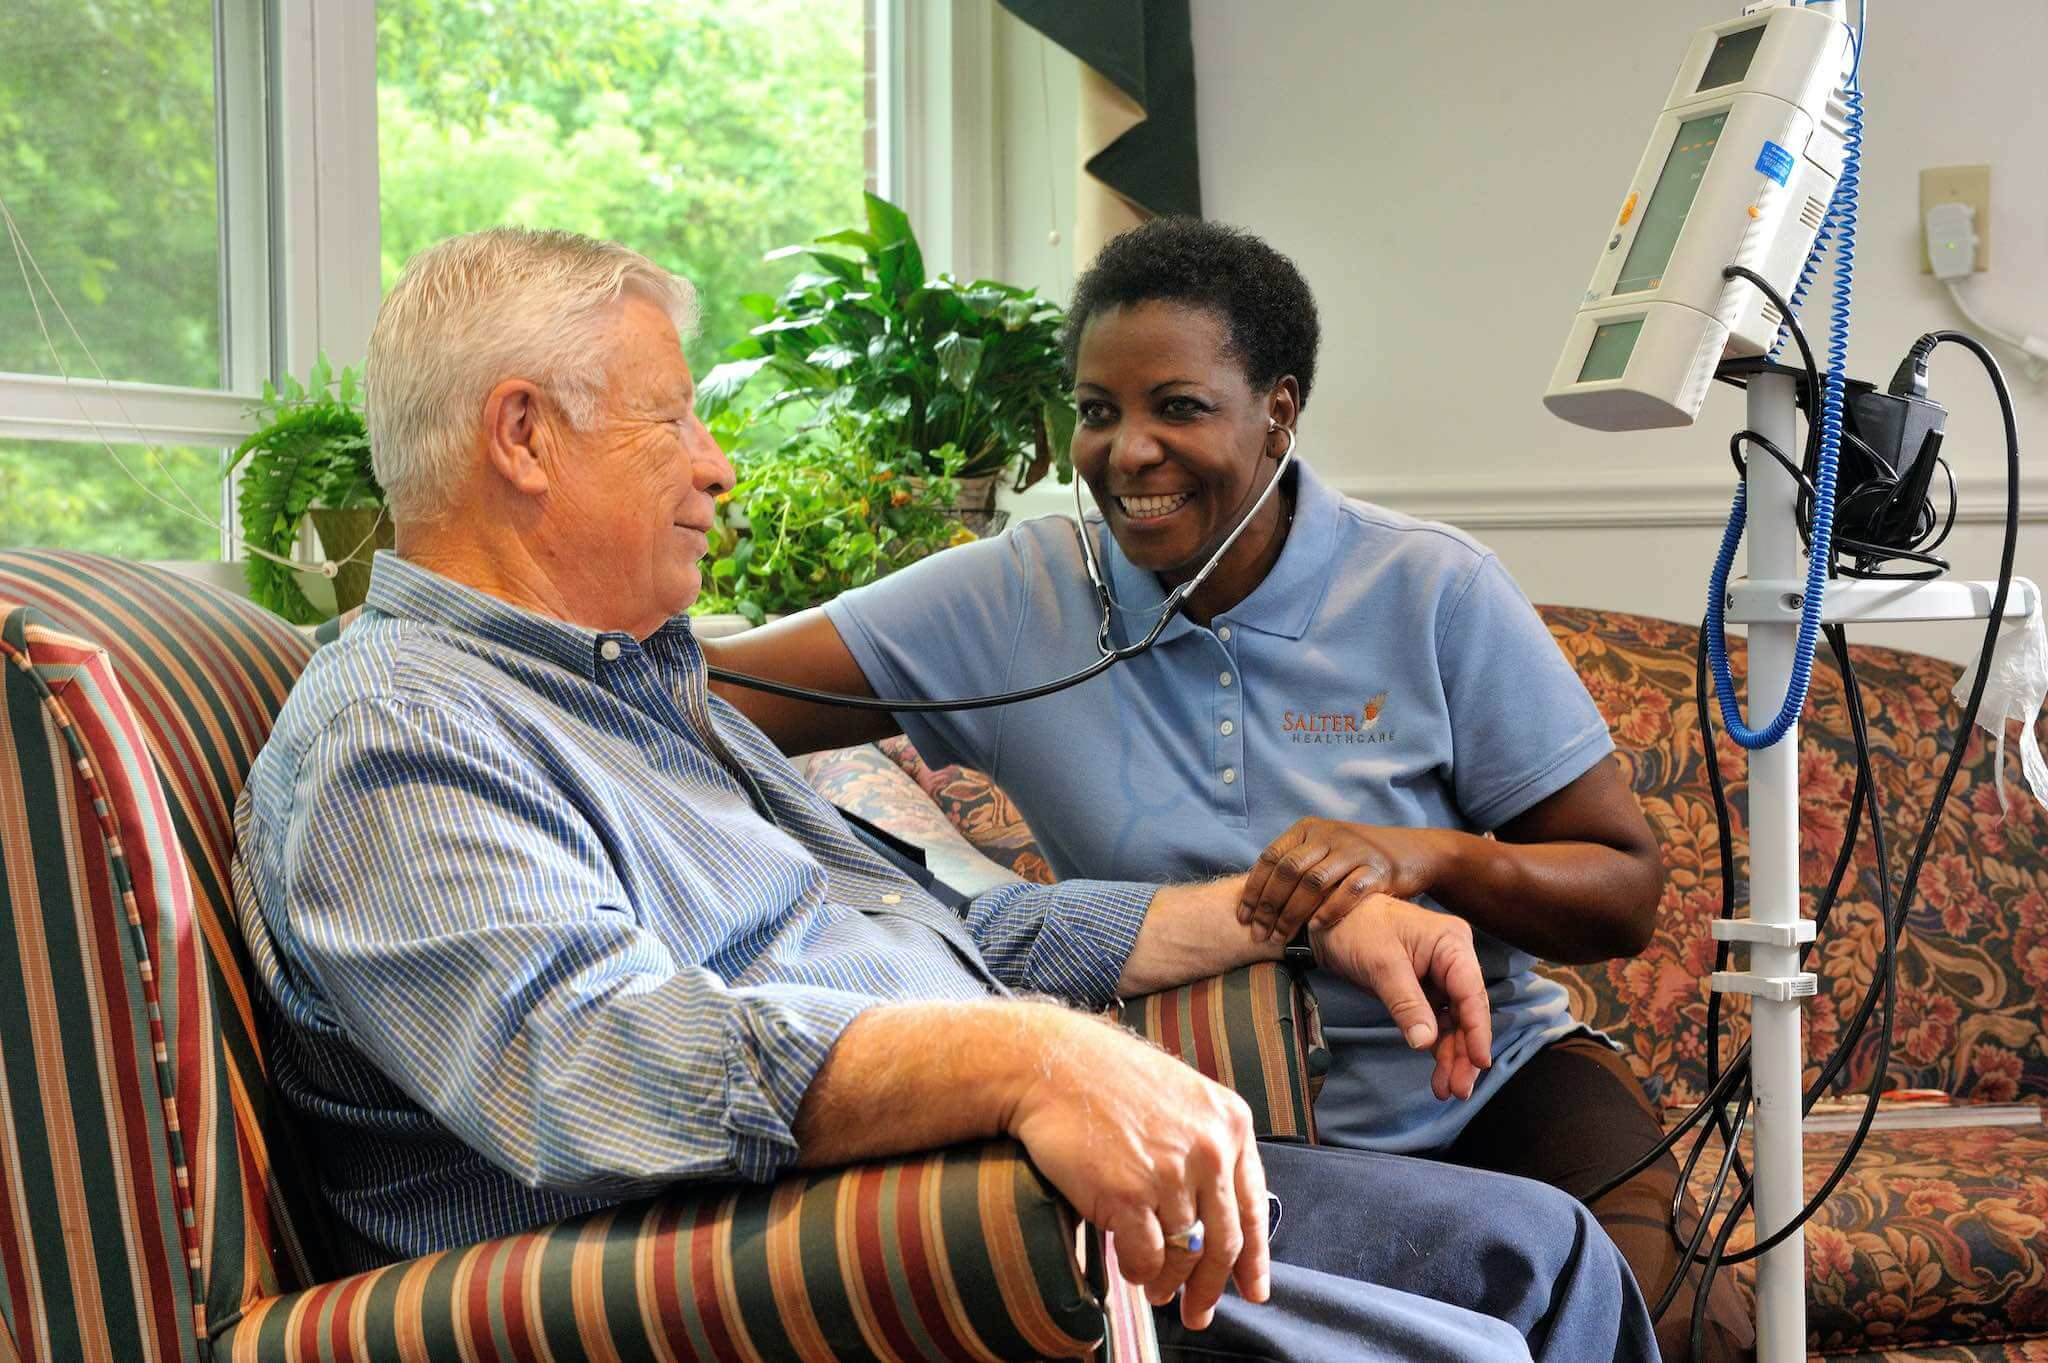 Salter Healthcare Nurse and Patient